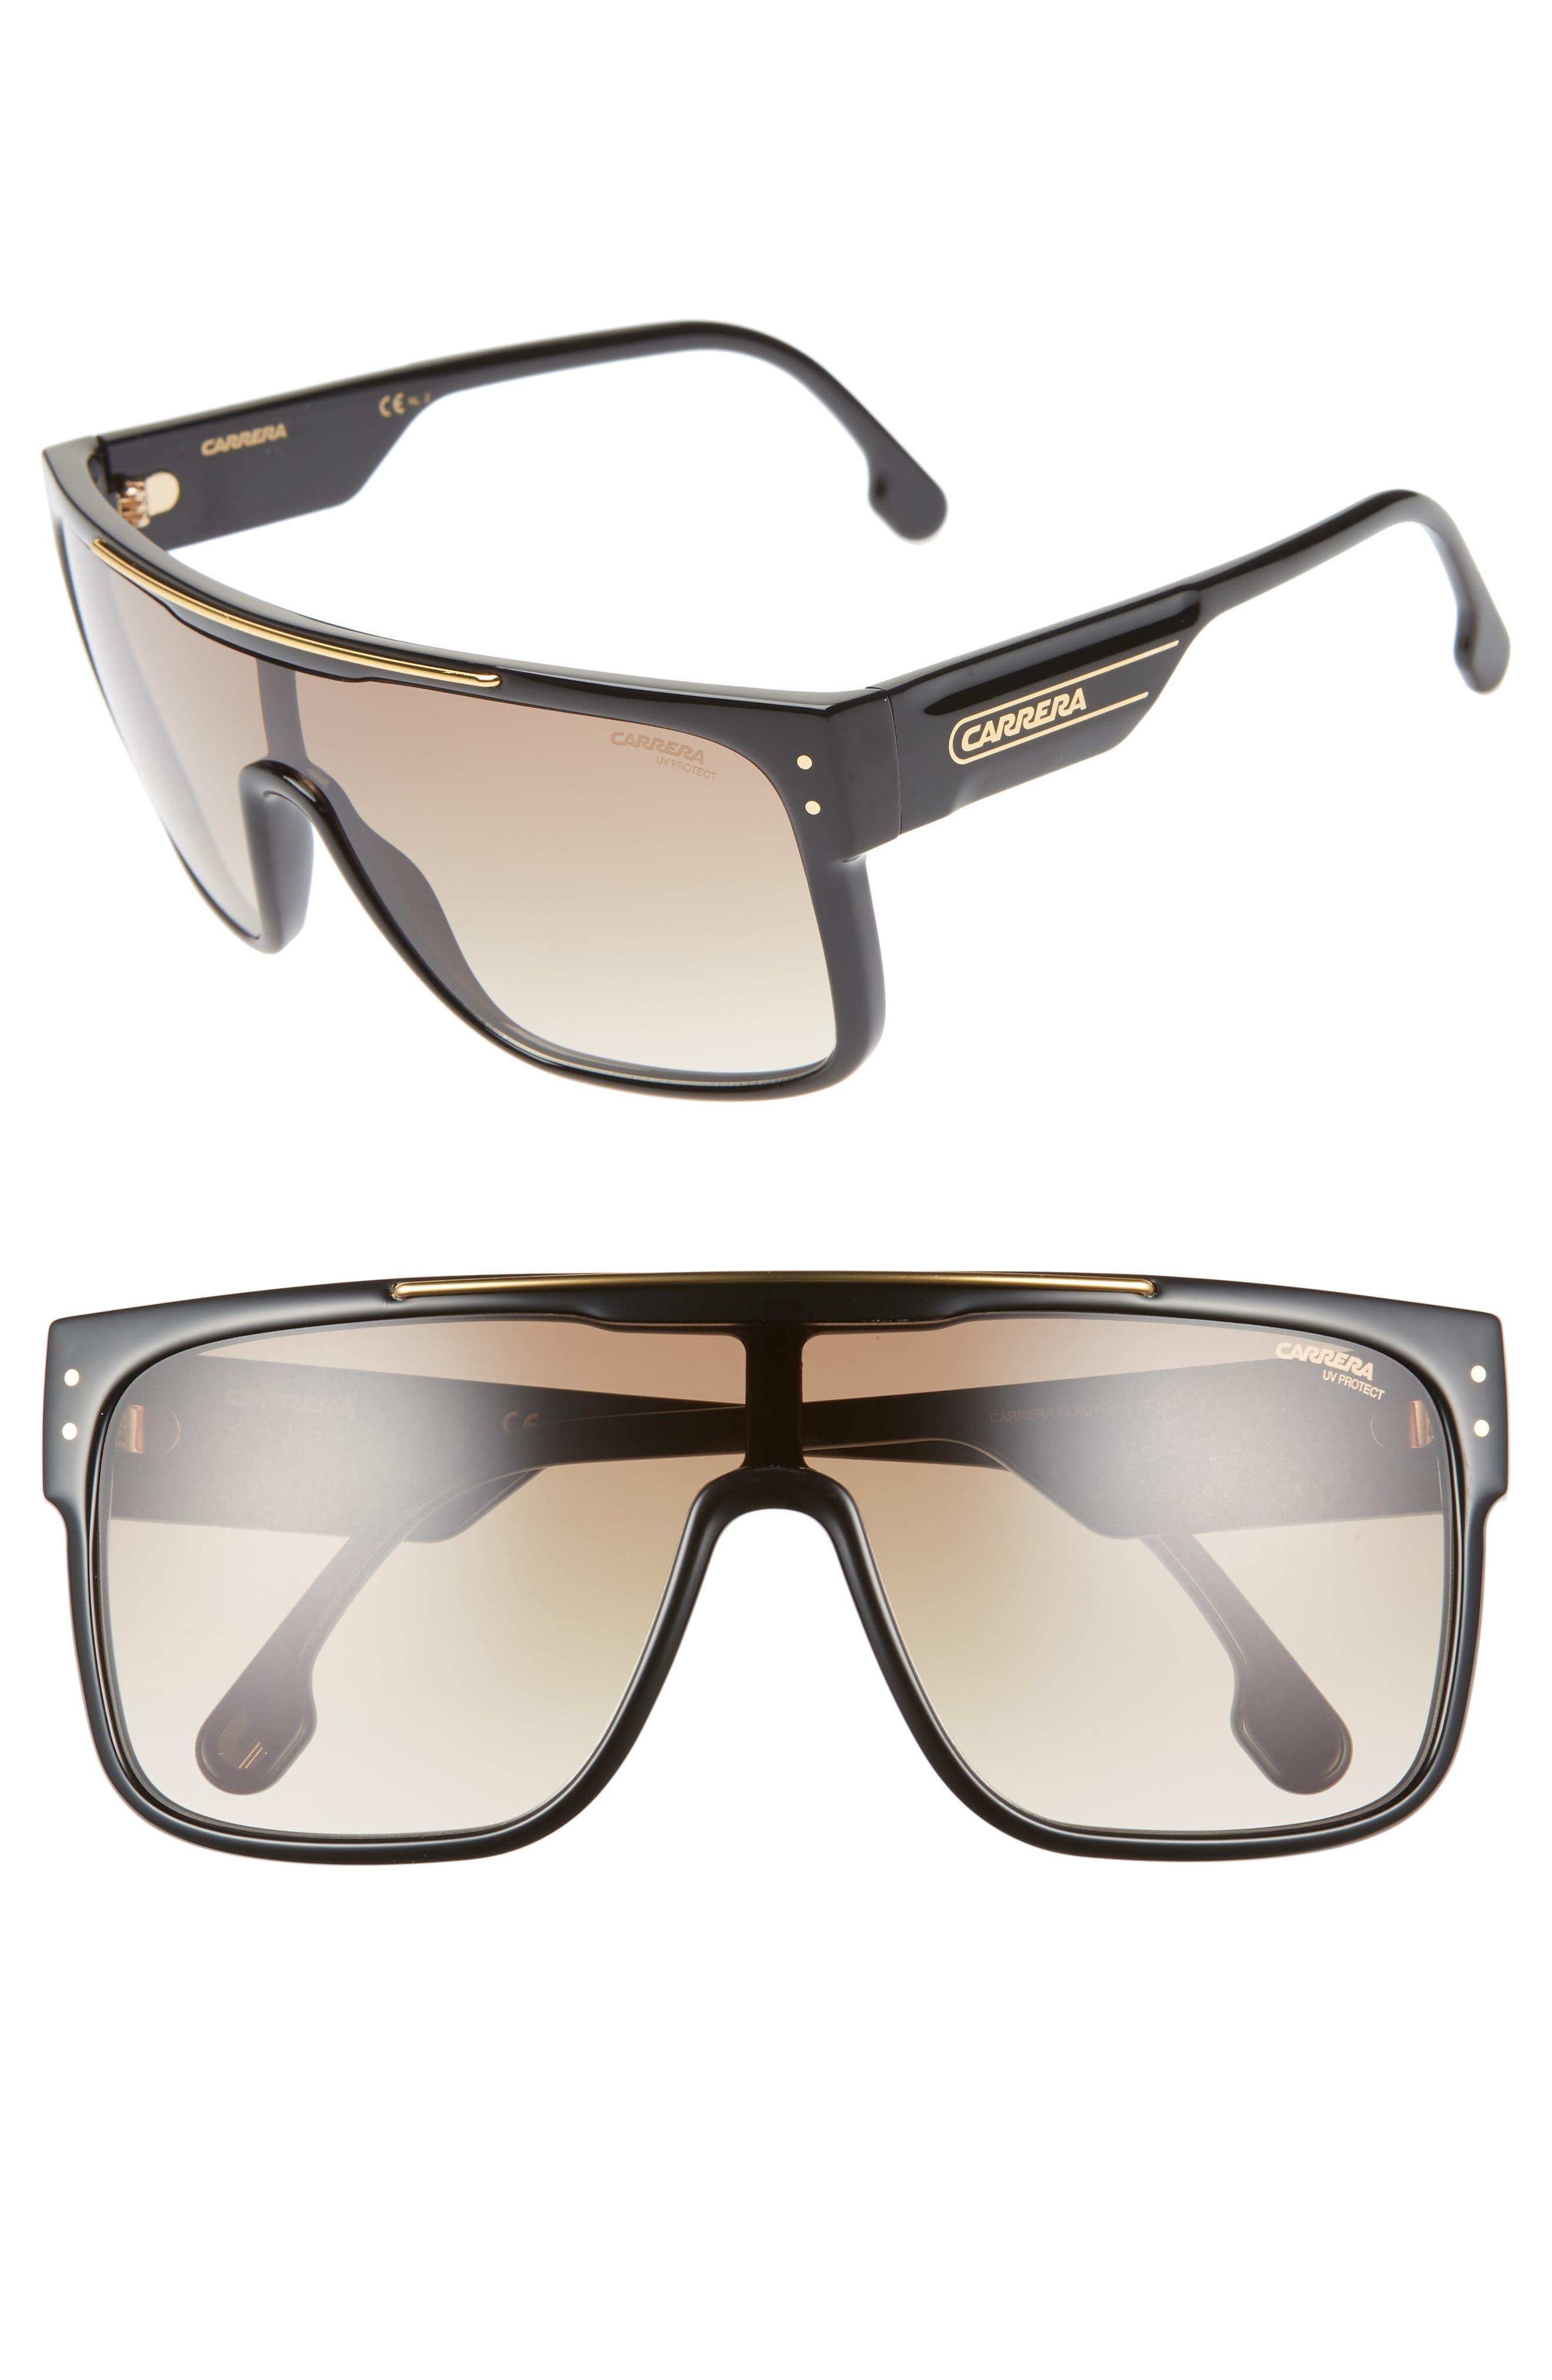 Carrera Eyewear Flagstop Ii 140Mm Flat Top Sunglasses -